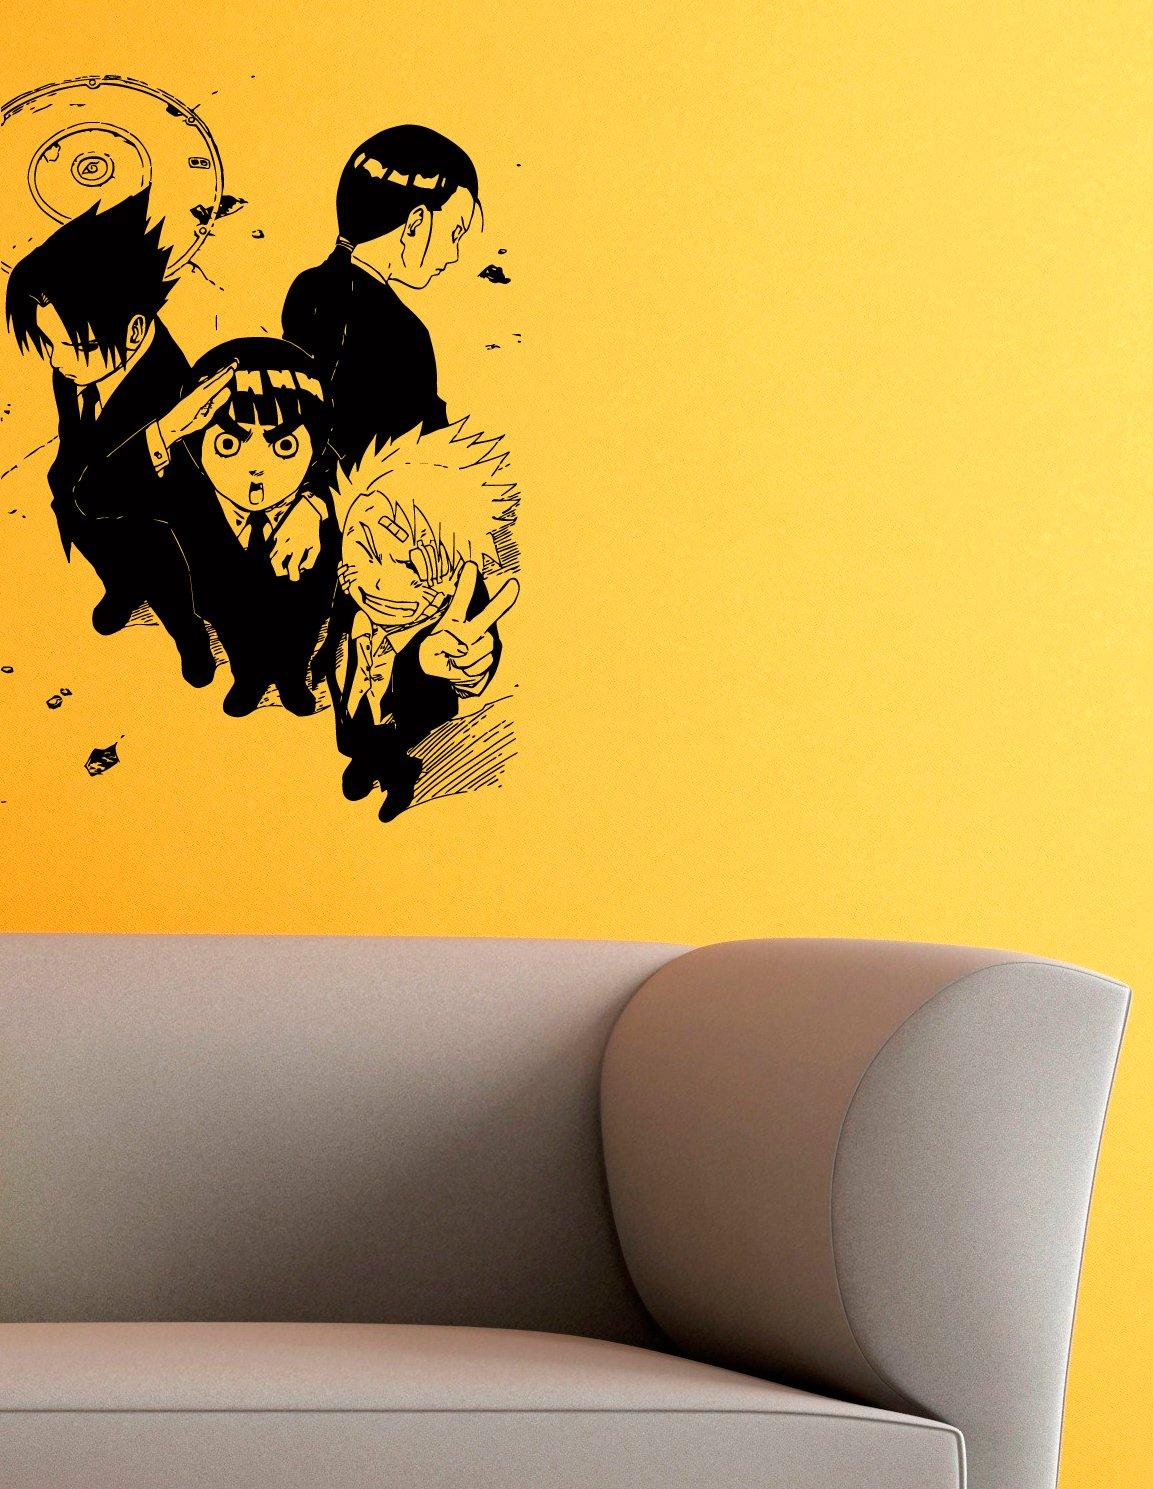 Amazon.com: Naruto Sasuke Rock Lee and Neji Vinyl Wall ...